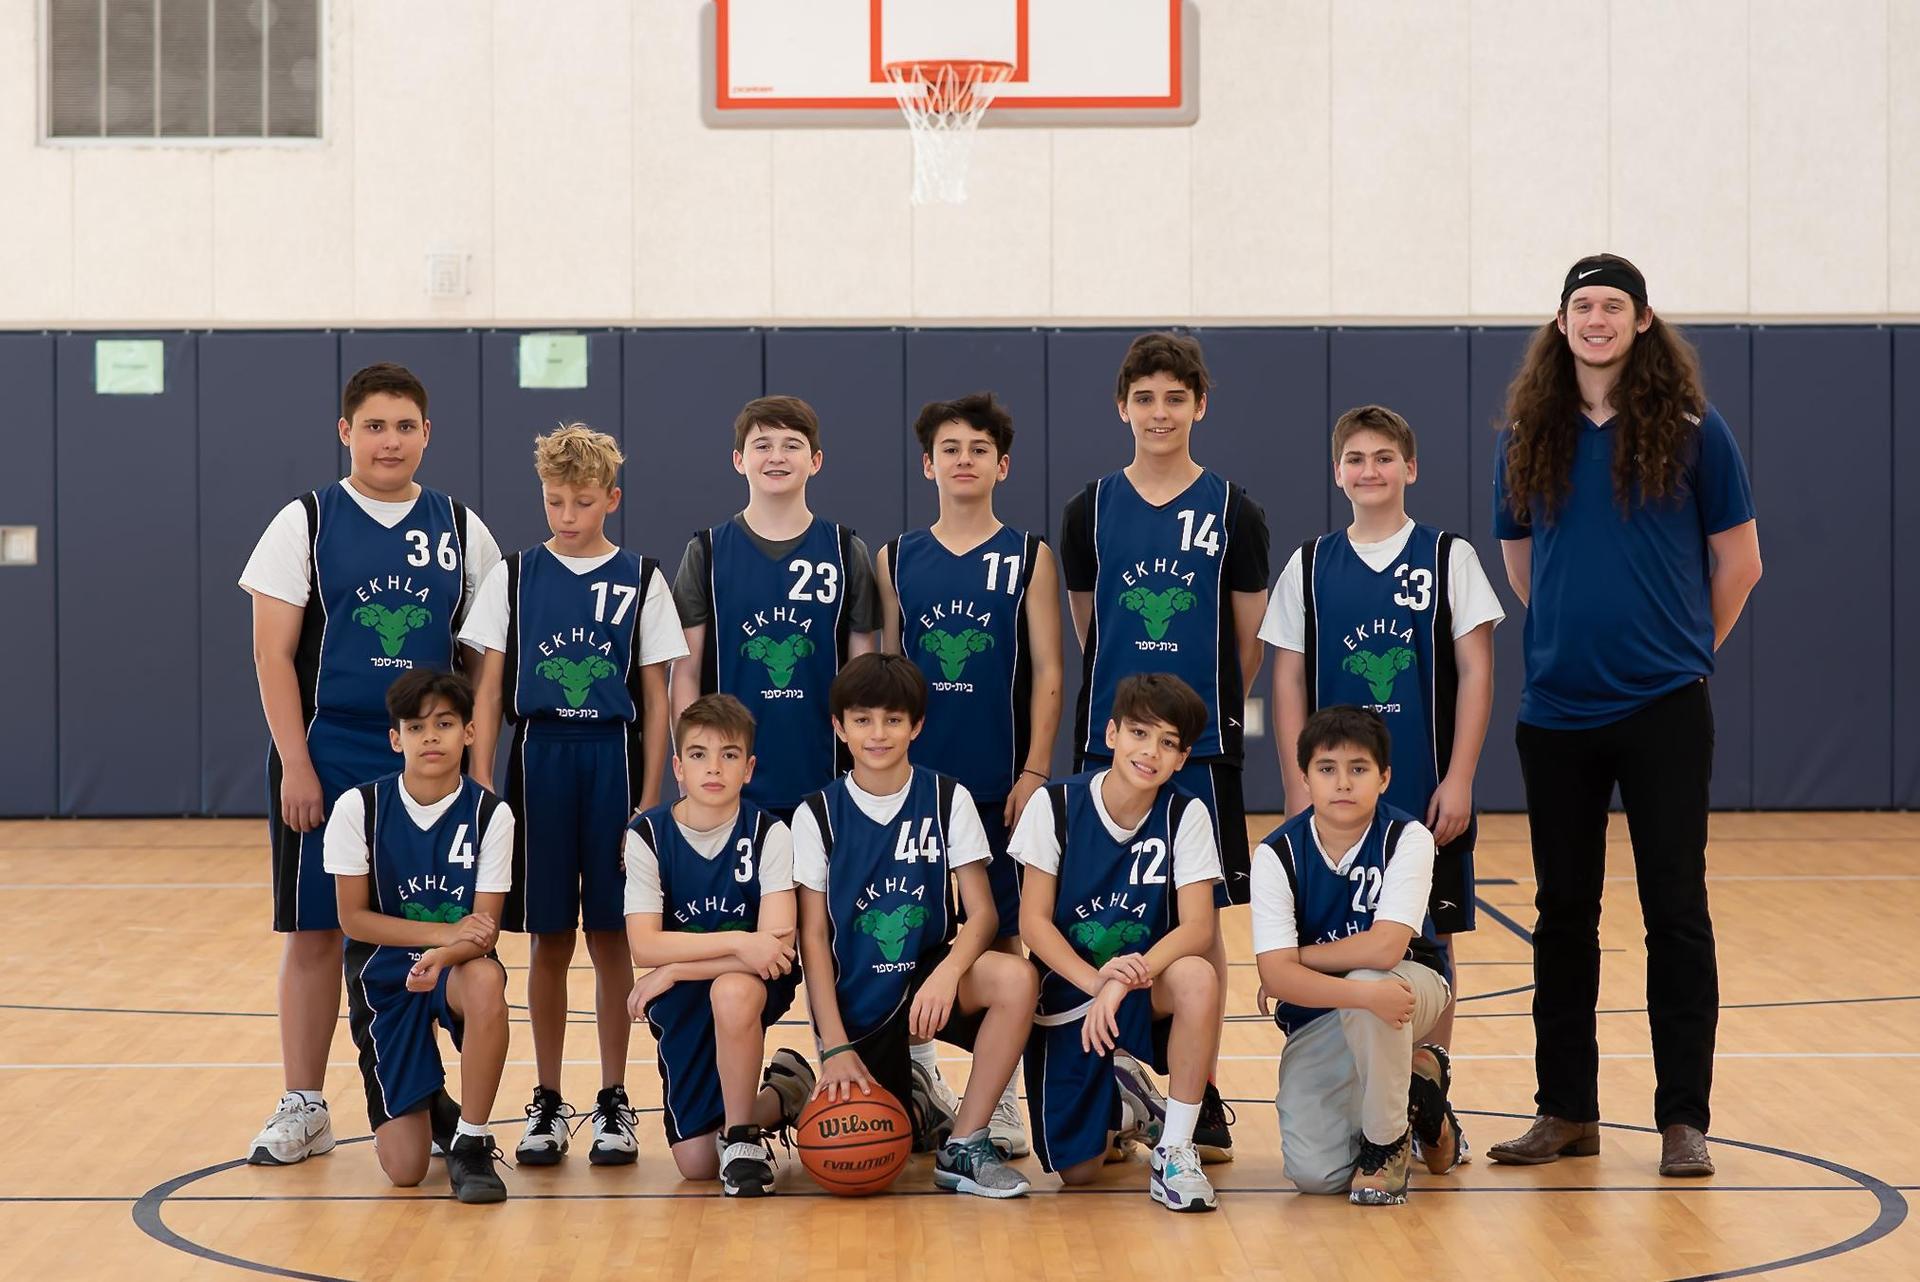 6-8 Team